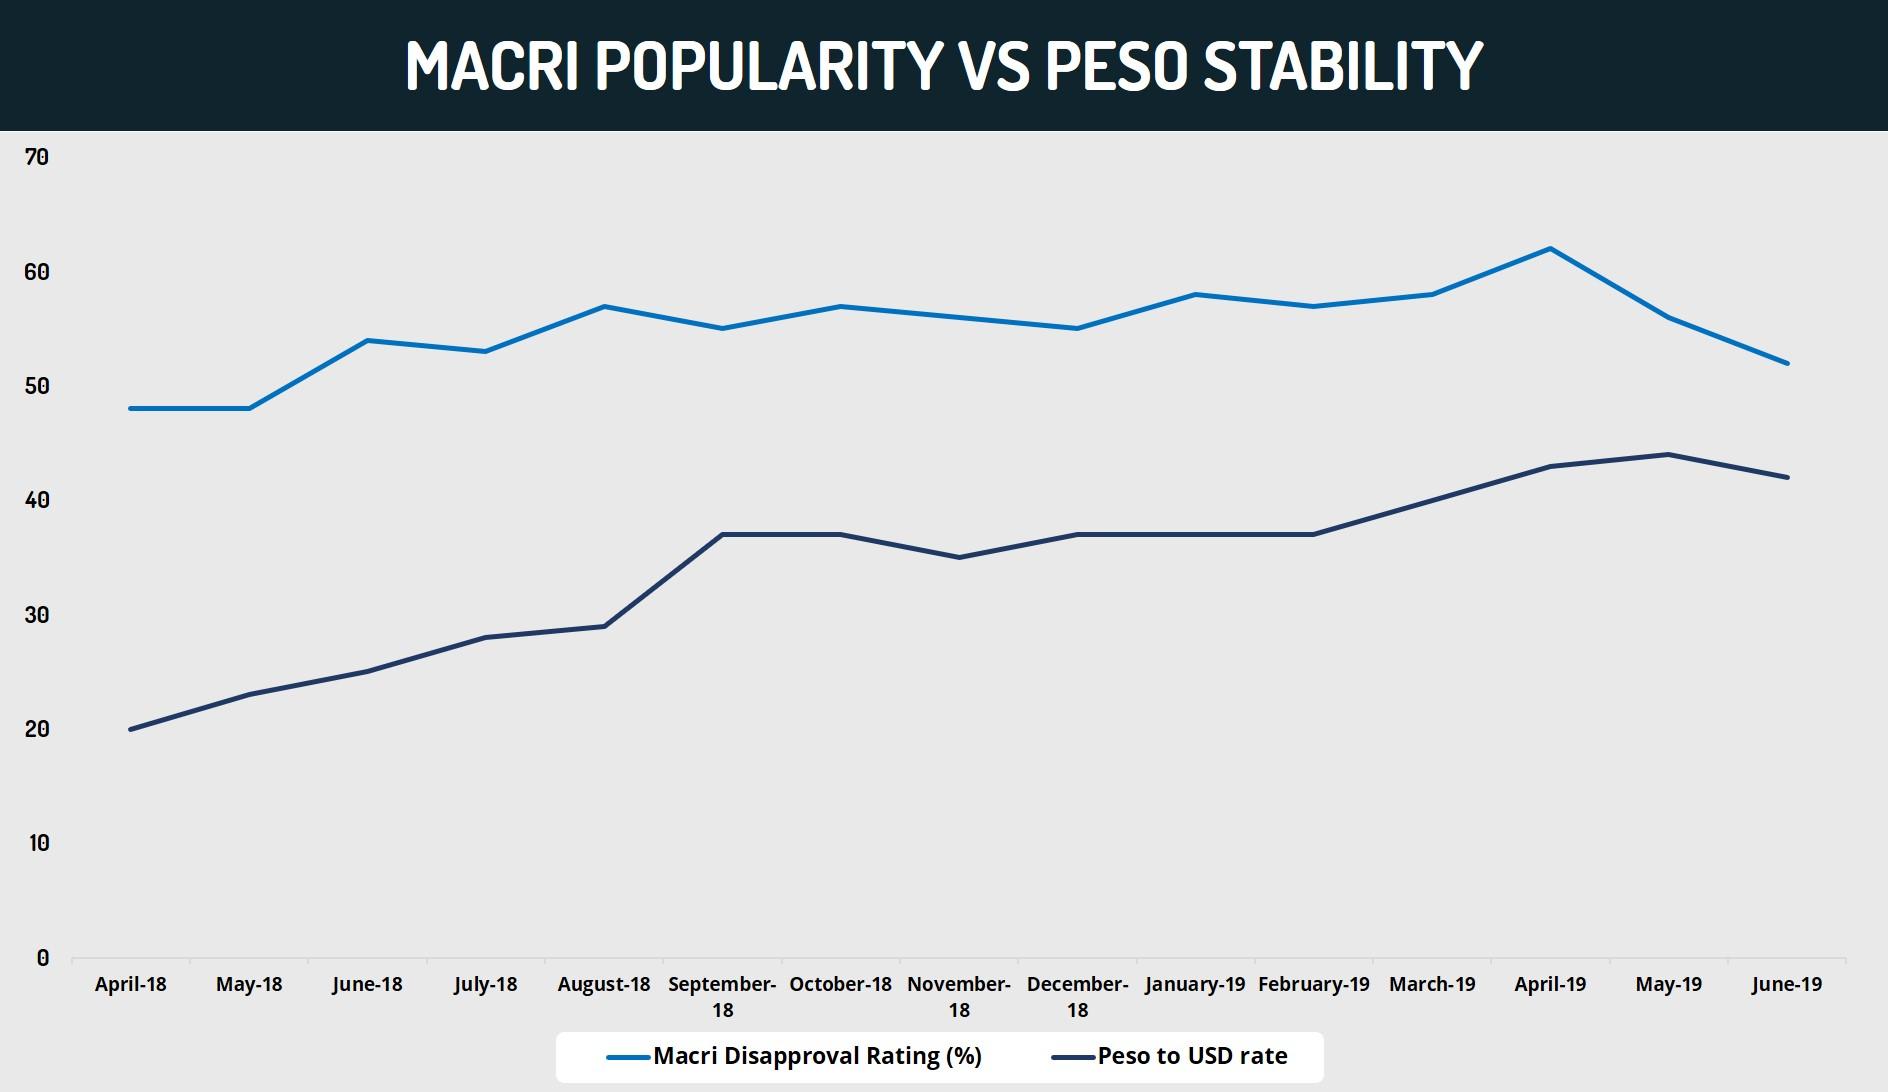 Marci Popularity VS Peso Stability